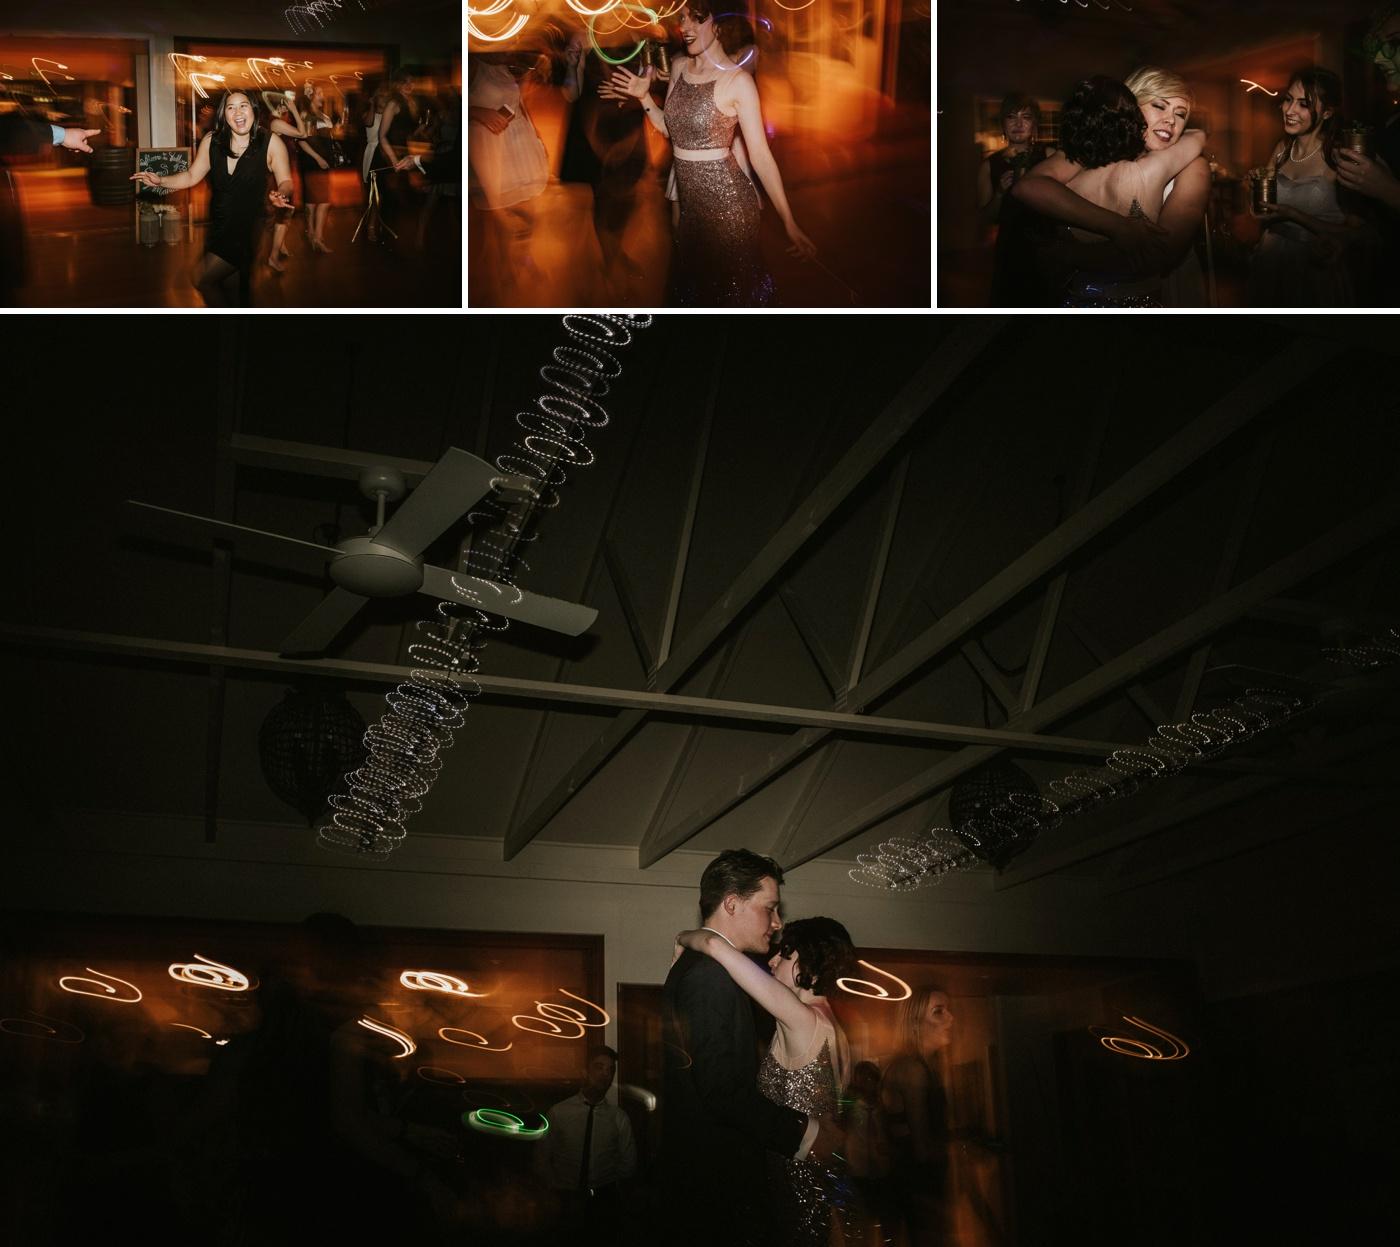 Emma&Morgan_Melbourne-Vintage-Elegant-Fun-Quirky-Yarra-Valley-Vineyard-Wedding_Melbourne-Wedding-Photography-113